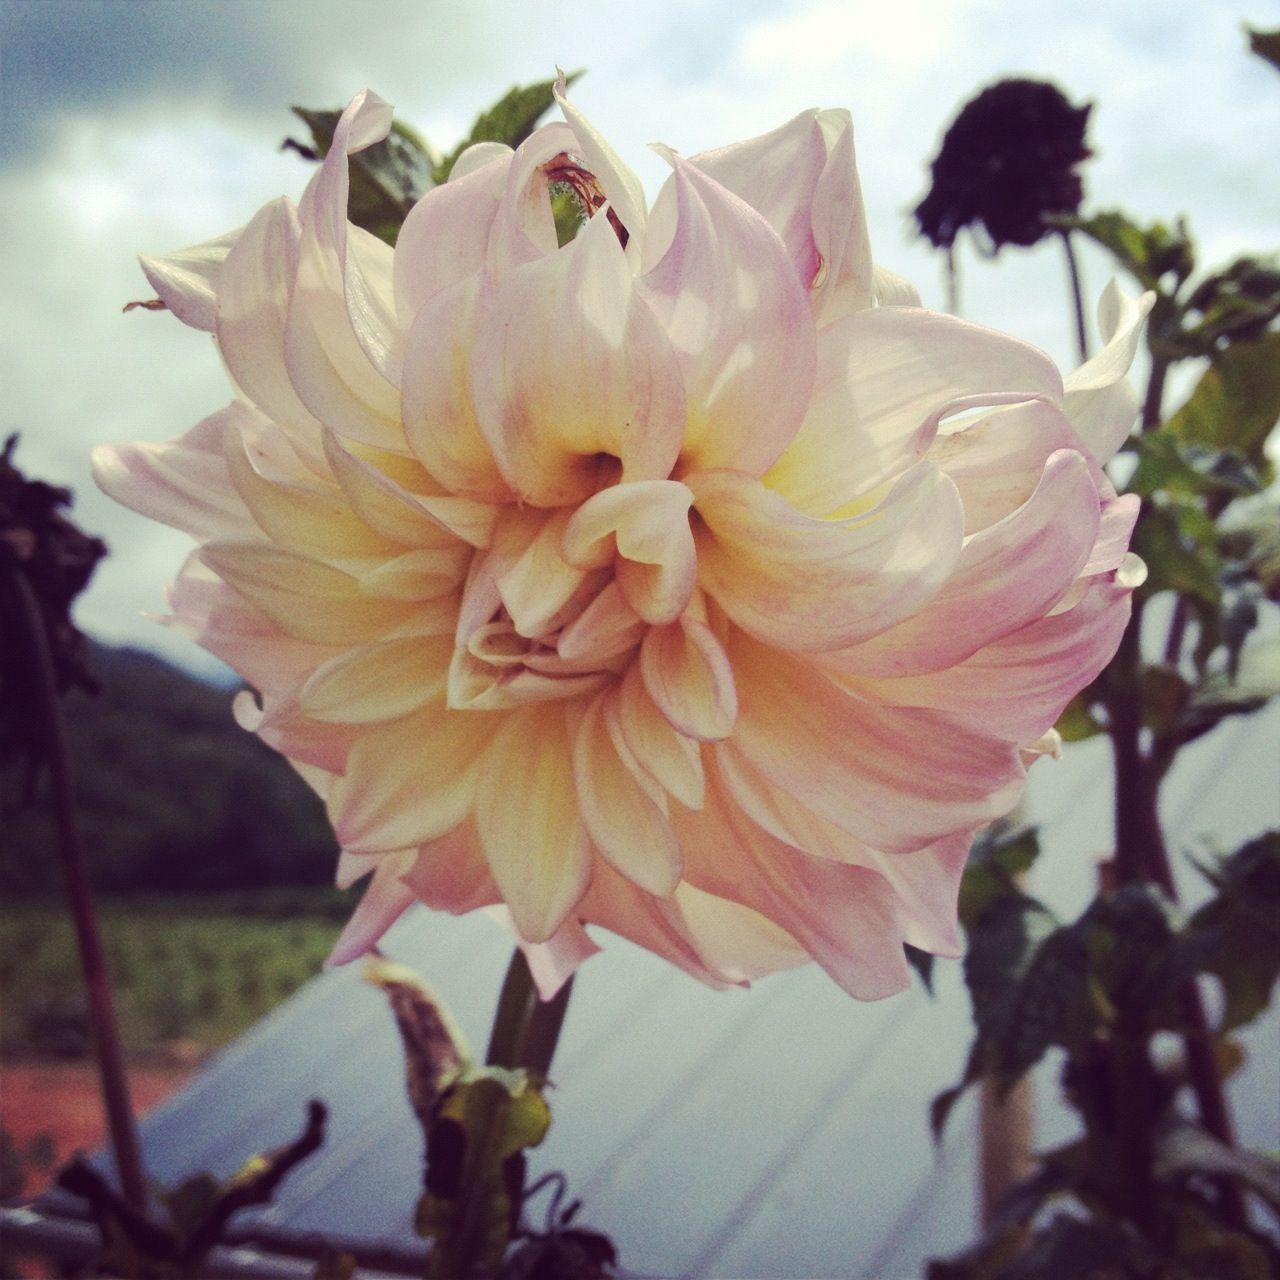 Summer  flowers north Carolina. Taken by me. (: